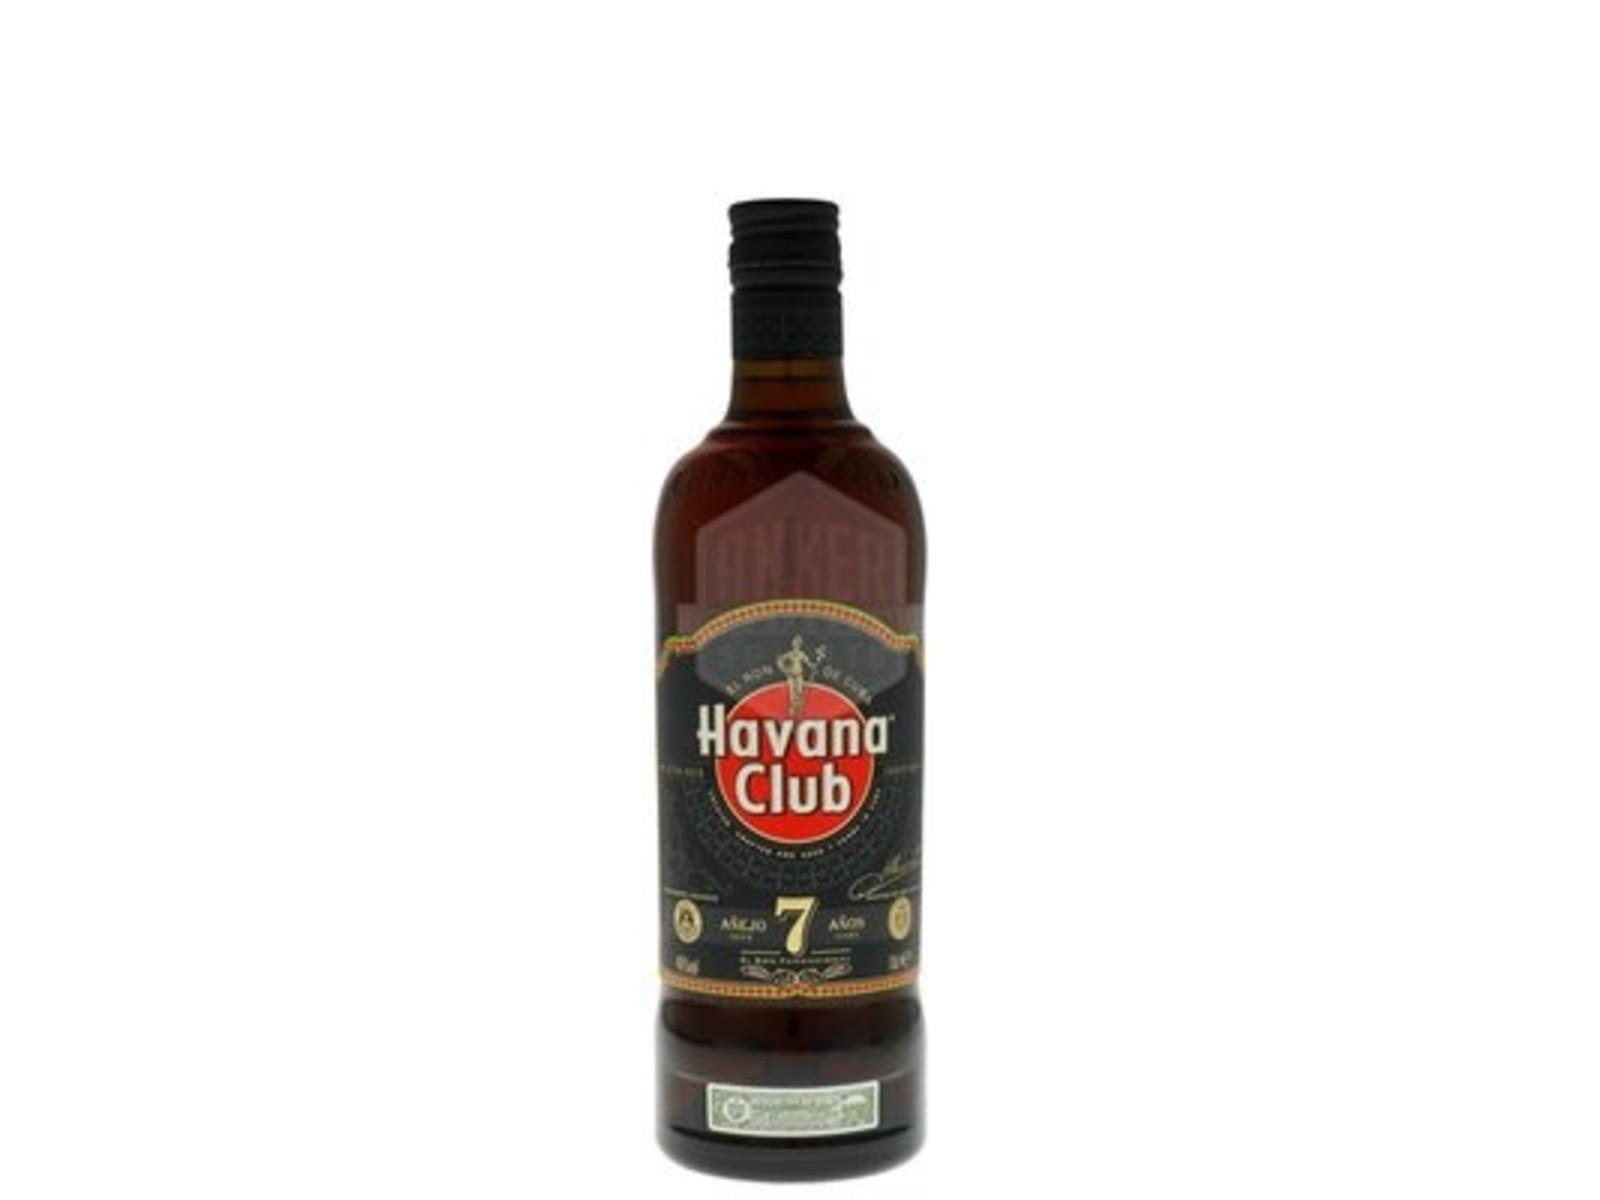 Havana Club Havana Club / Anejo 7 / 0.7L